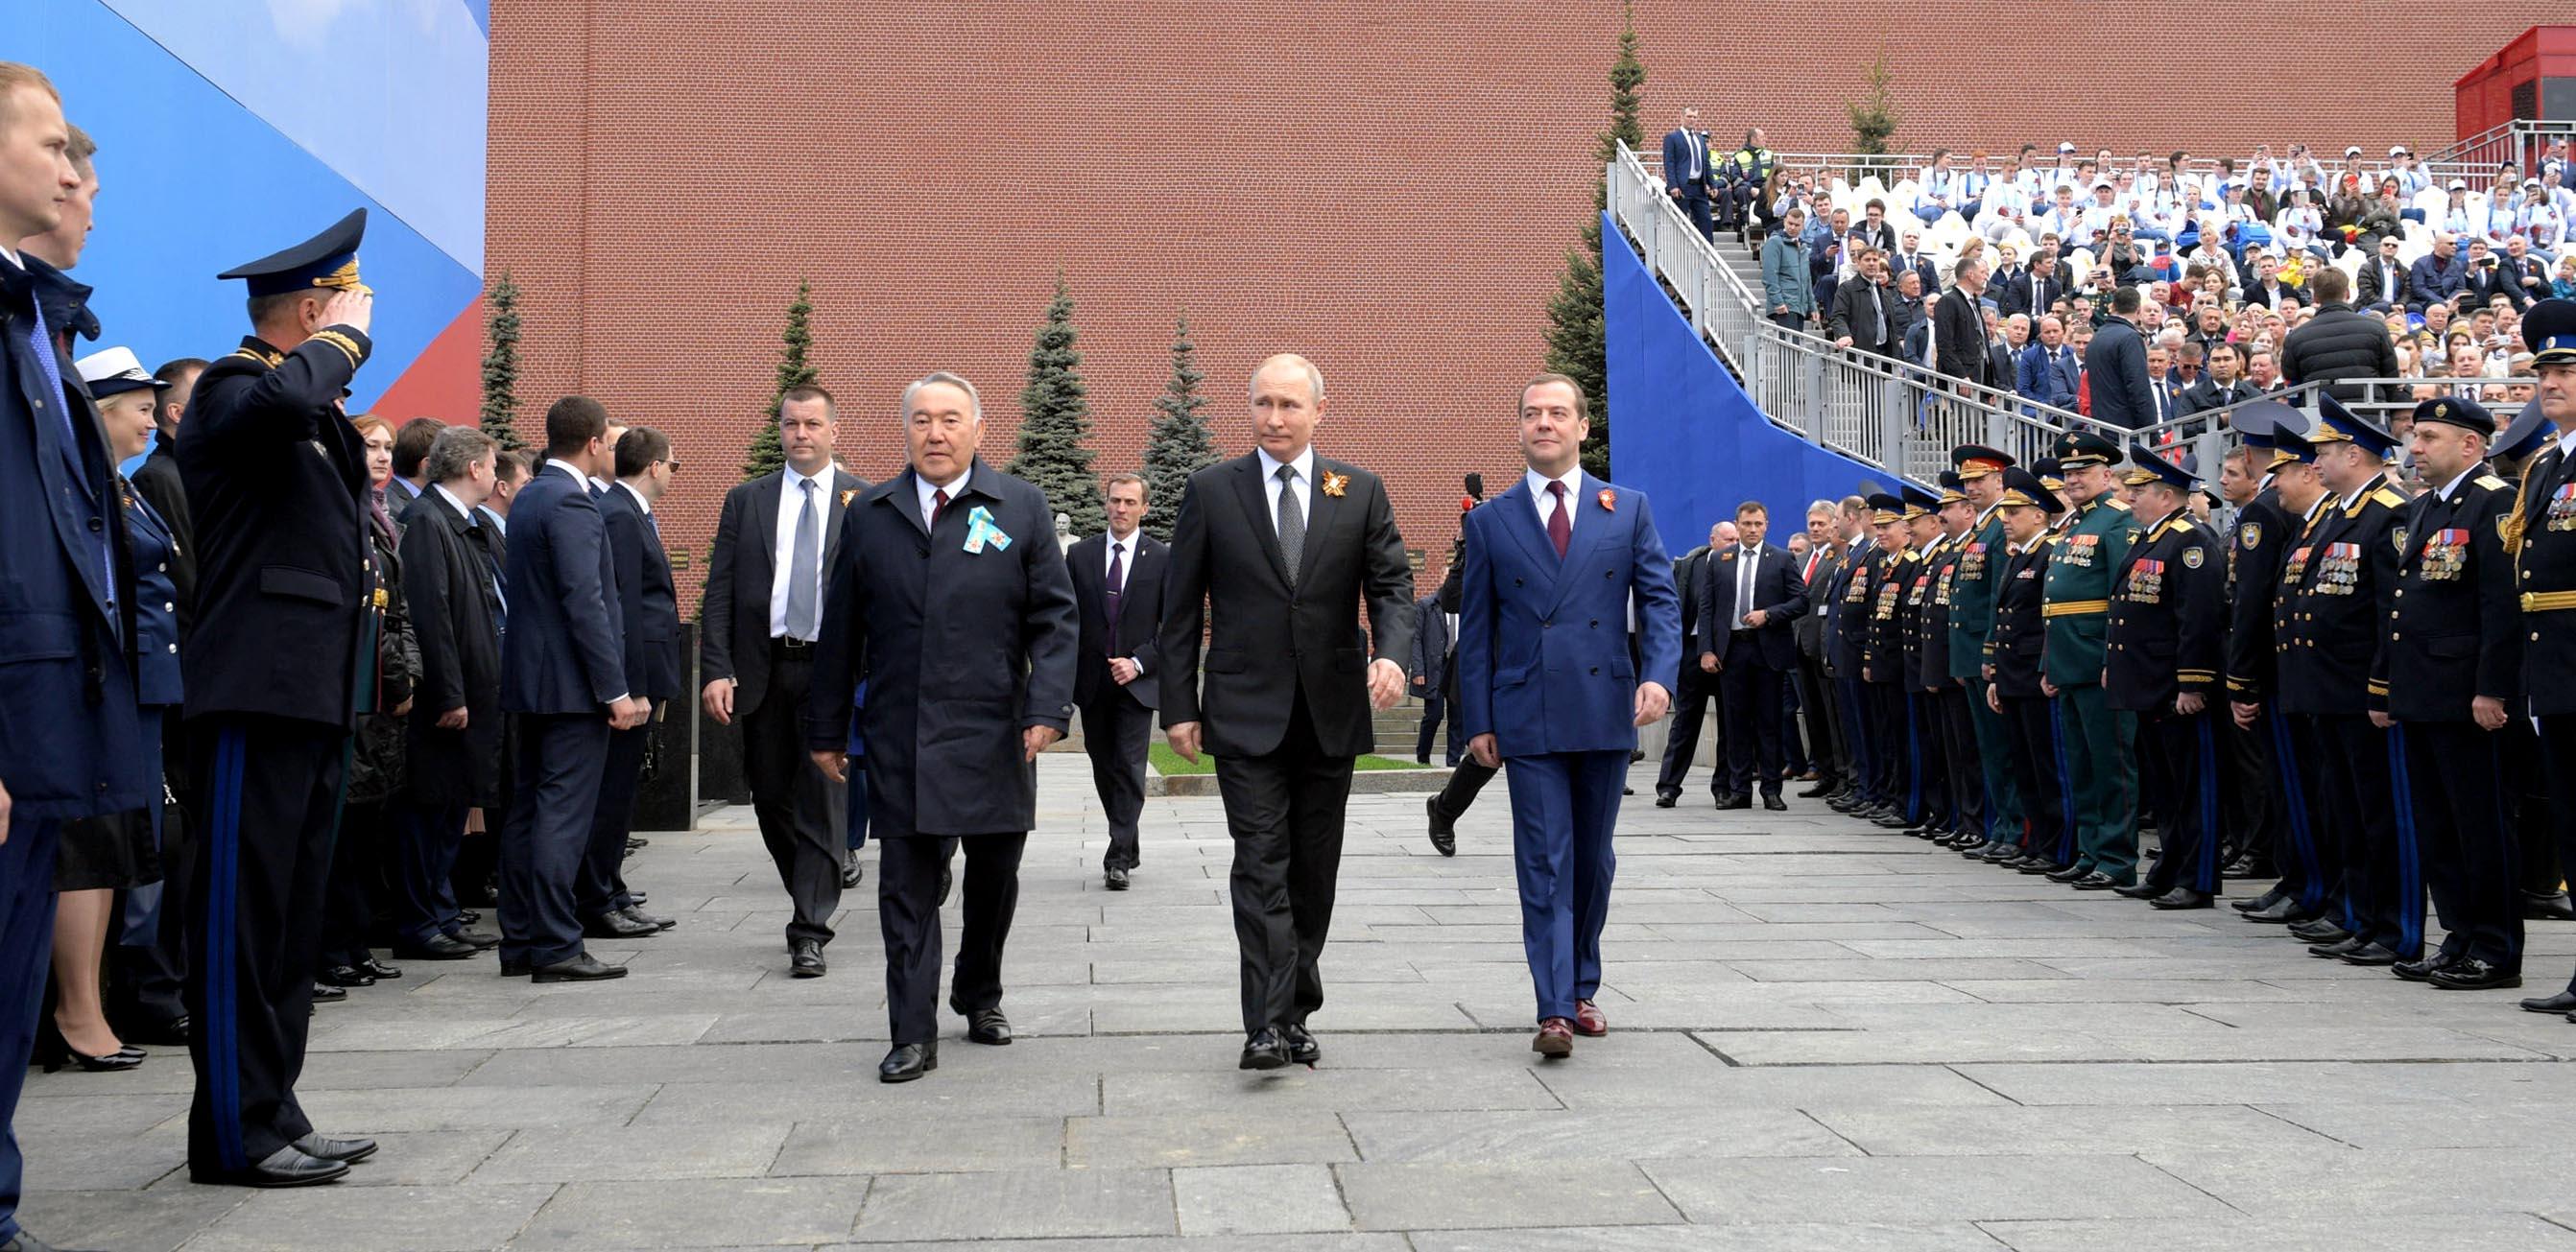 Нурсултан Назарбаев прибыл в Москву на парад Победы